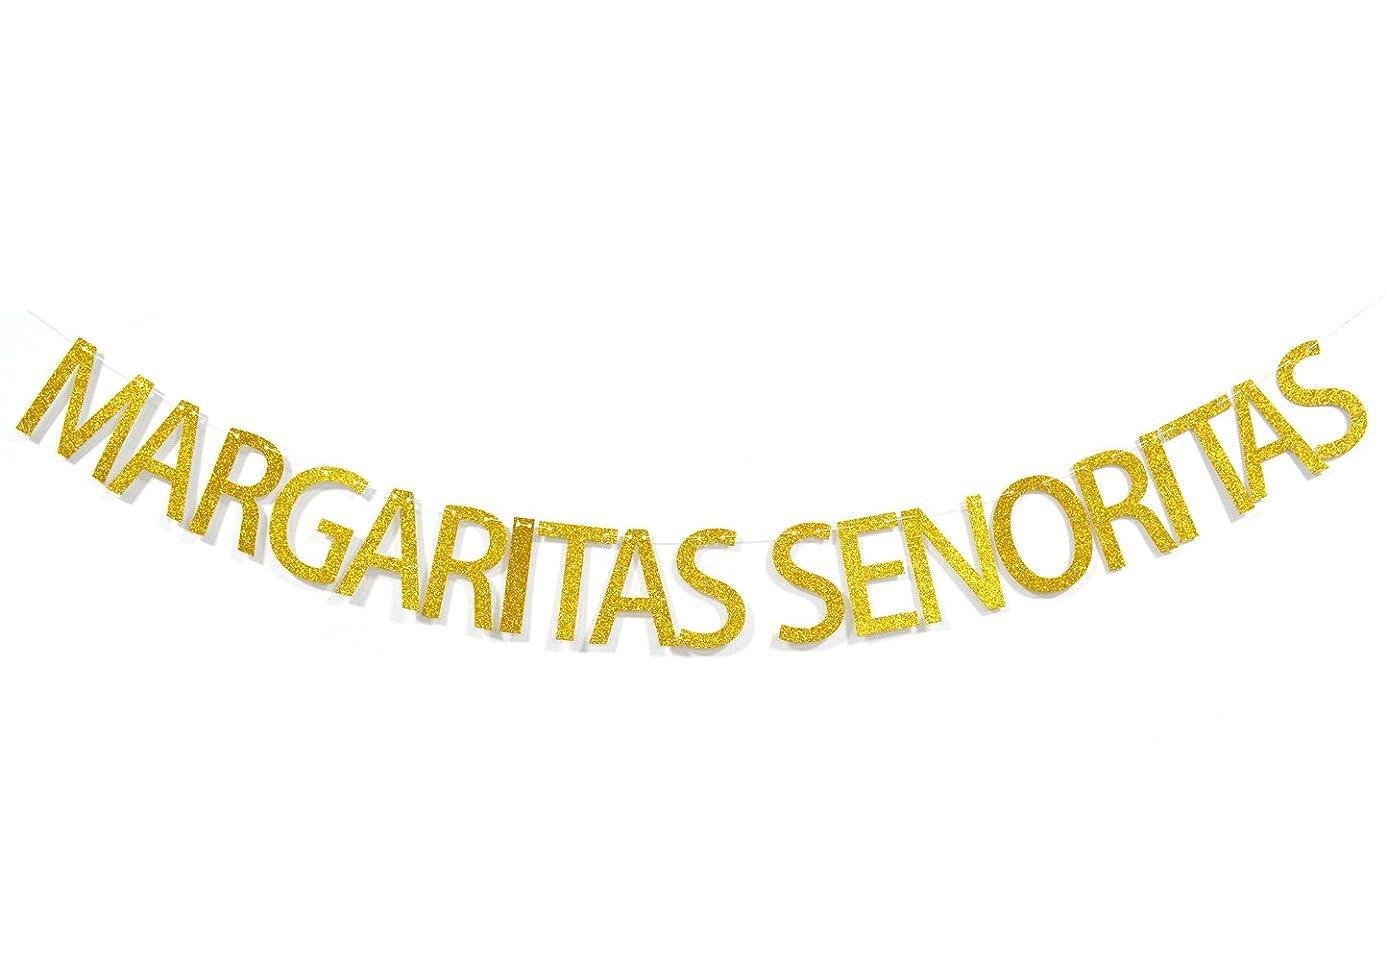 Margaritas Senoritas Gold Glitter Banner, Mexican Fiesta Party Supplies